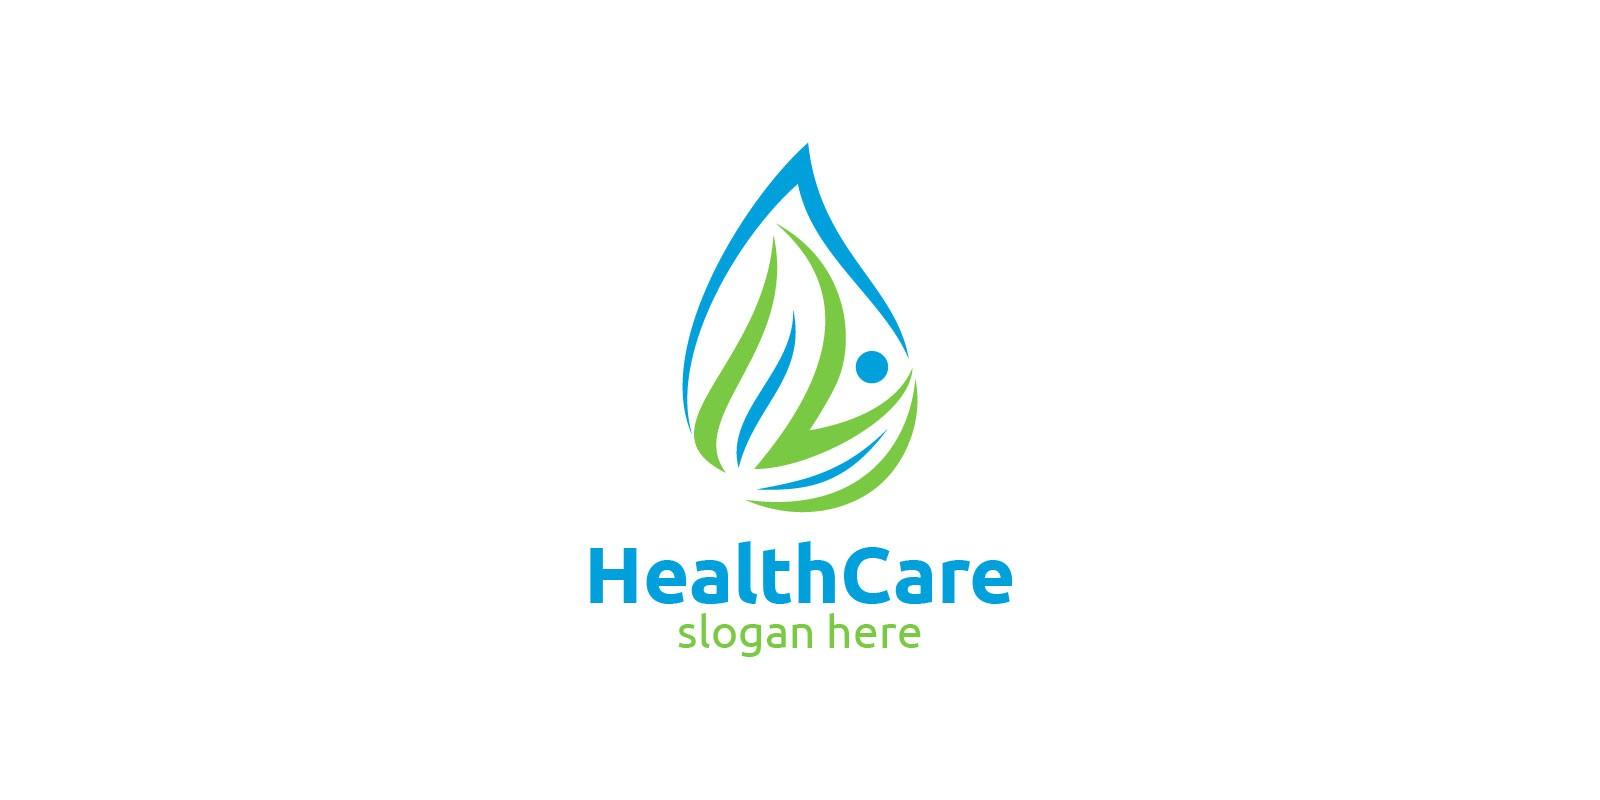 Water Drop Health Care Medical Logo Design